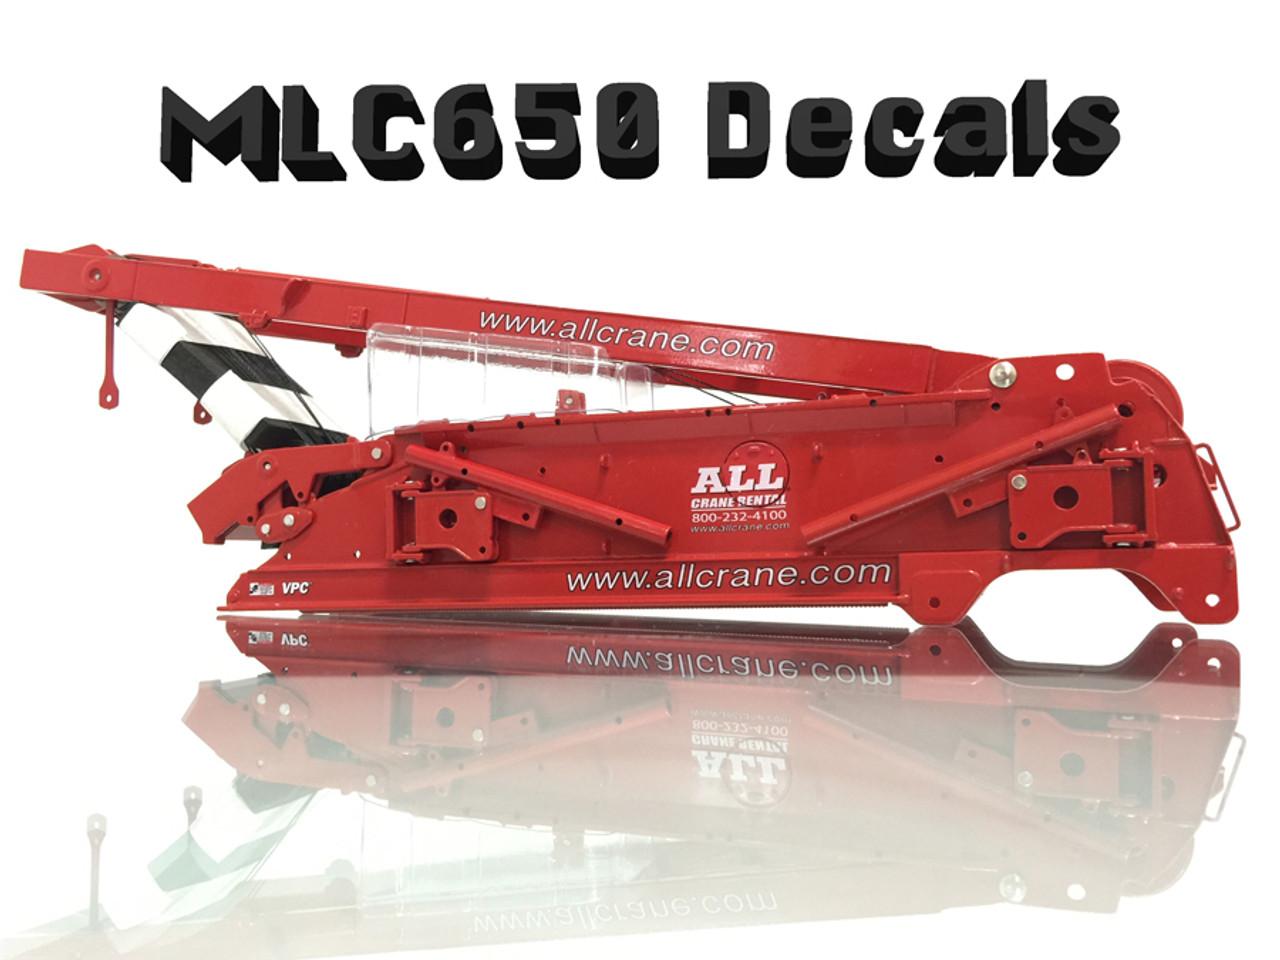 MLC650 Decals